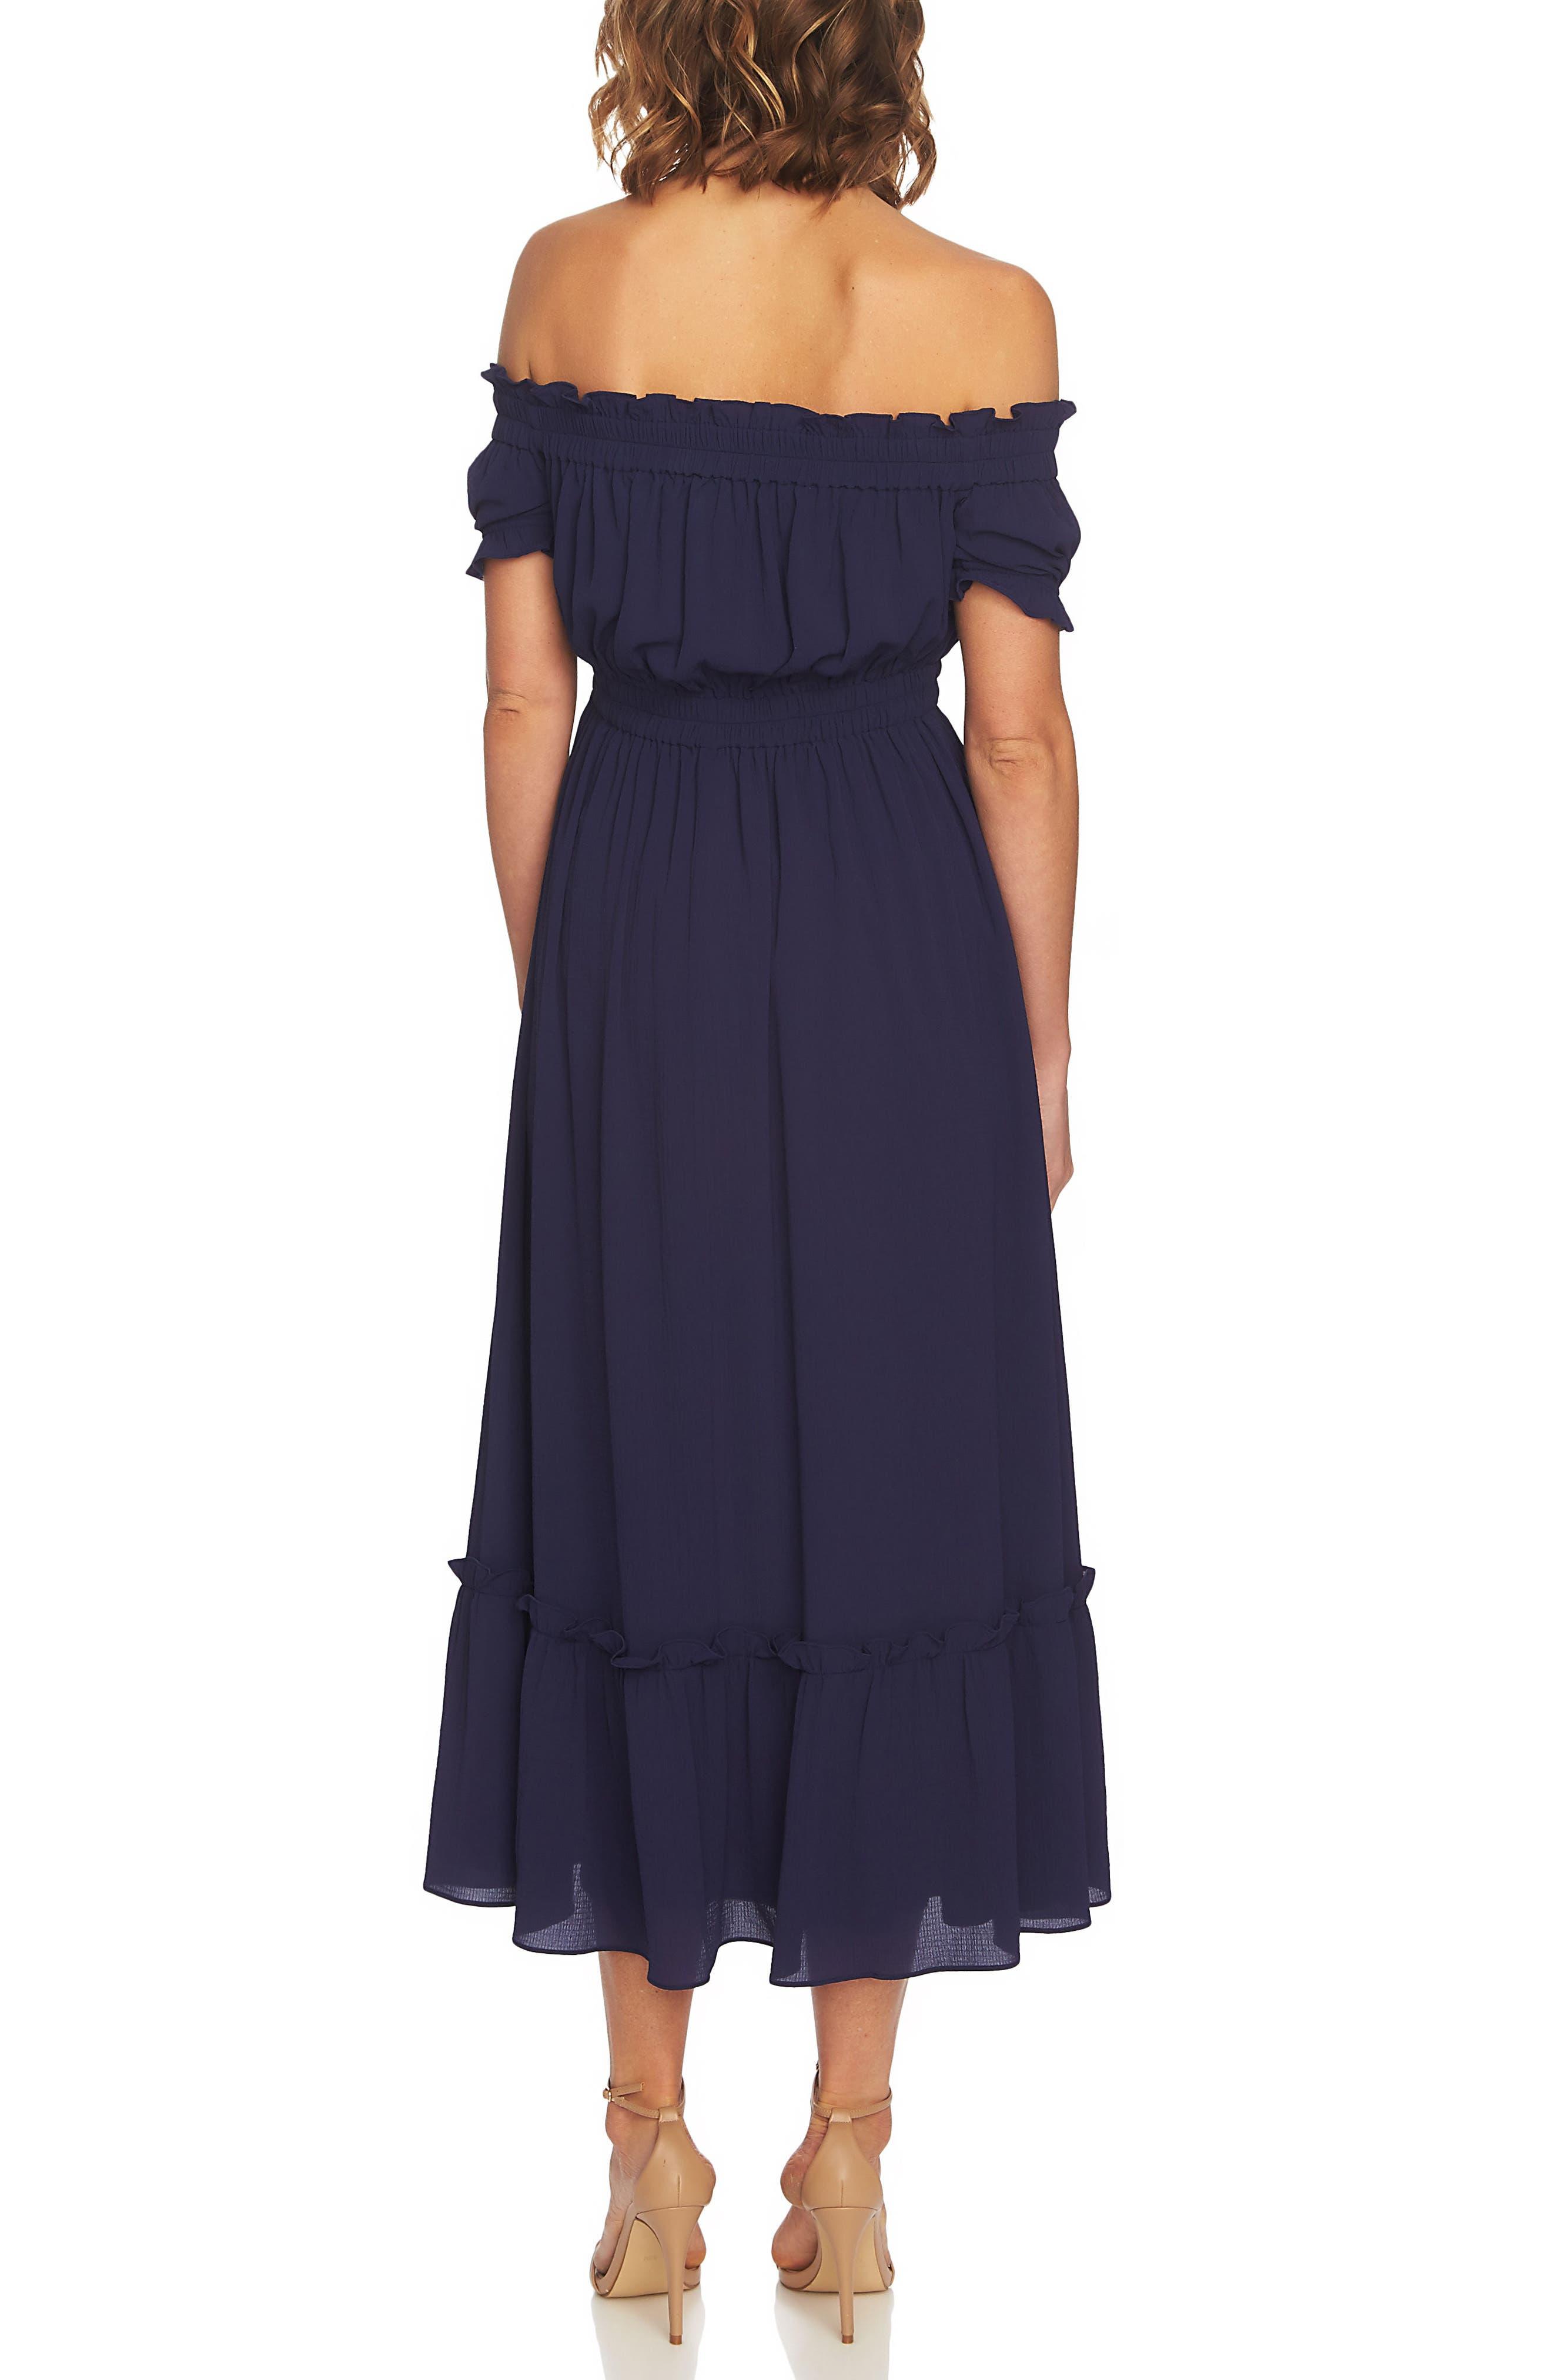 Vivian Off the Shoulder Smocked Maxi Dress,                             Alternate thumbnail 2, color,                             452